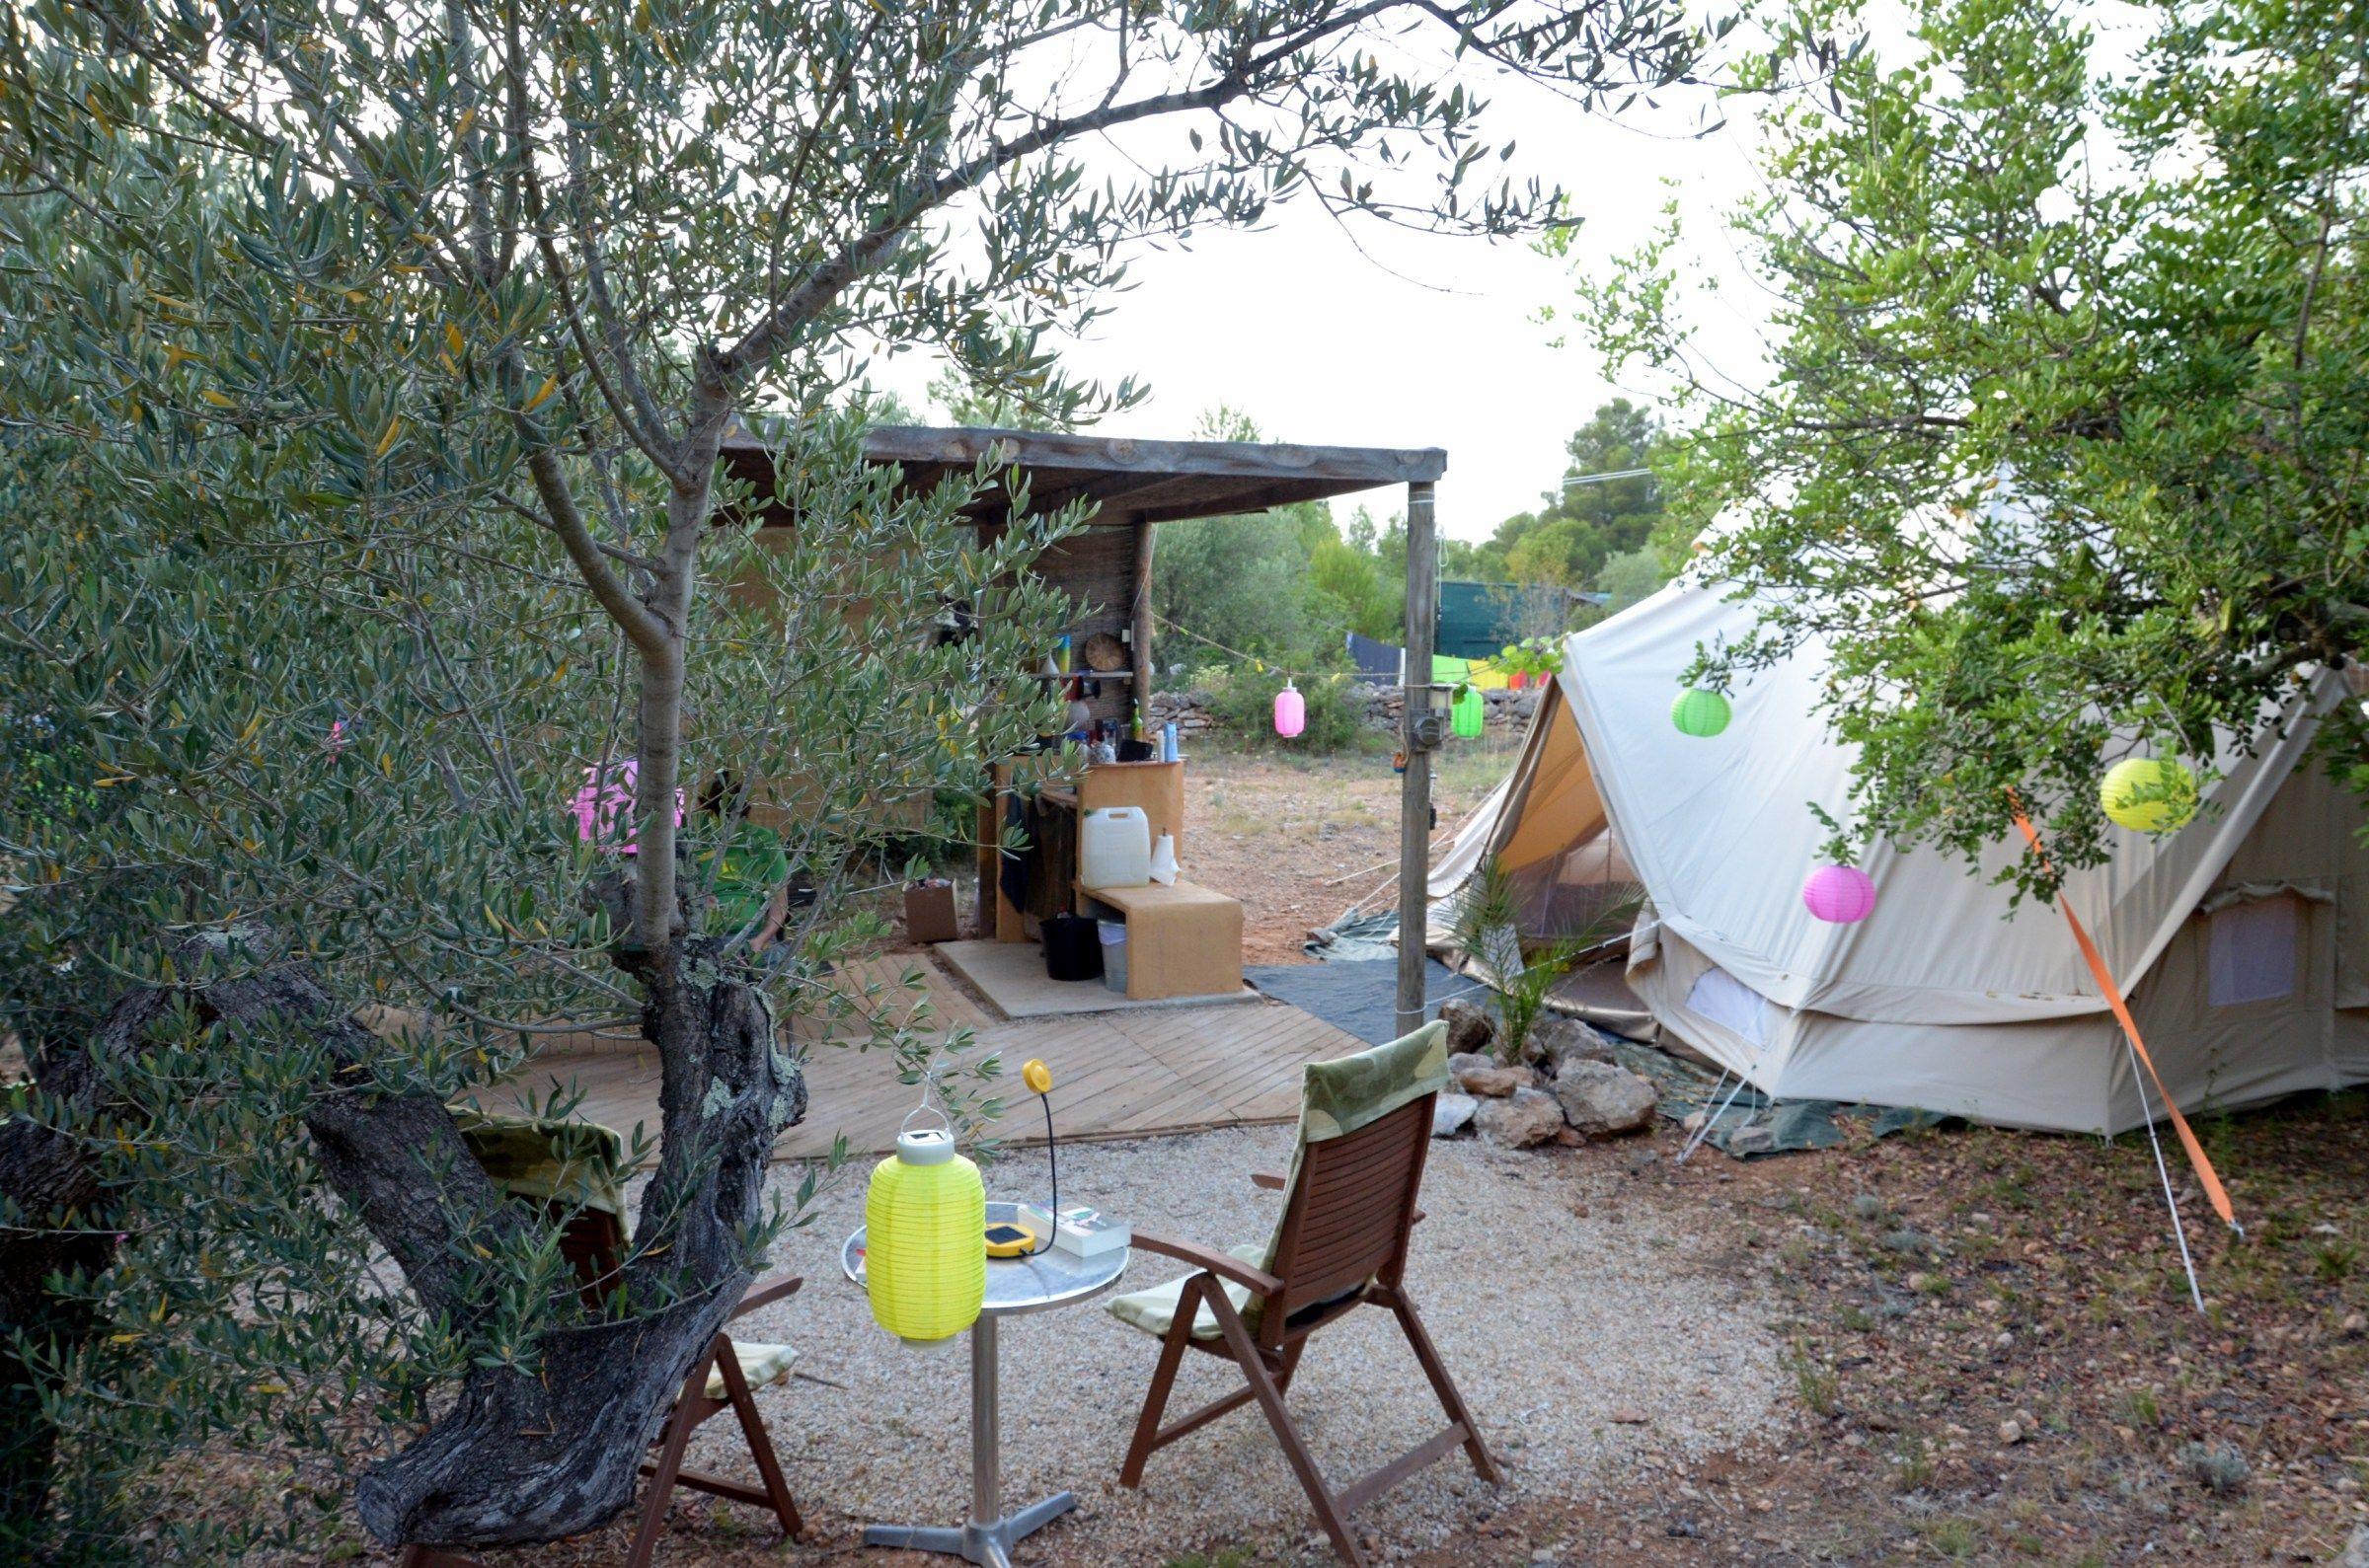 pippilangkous camping casa valerosa | kleine camping in noord spanje